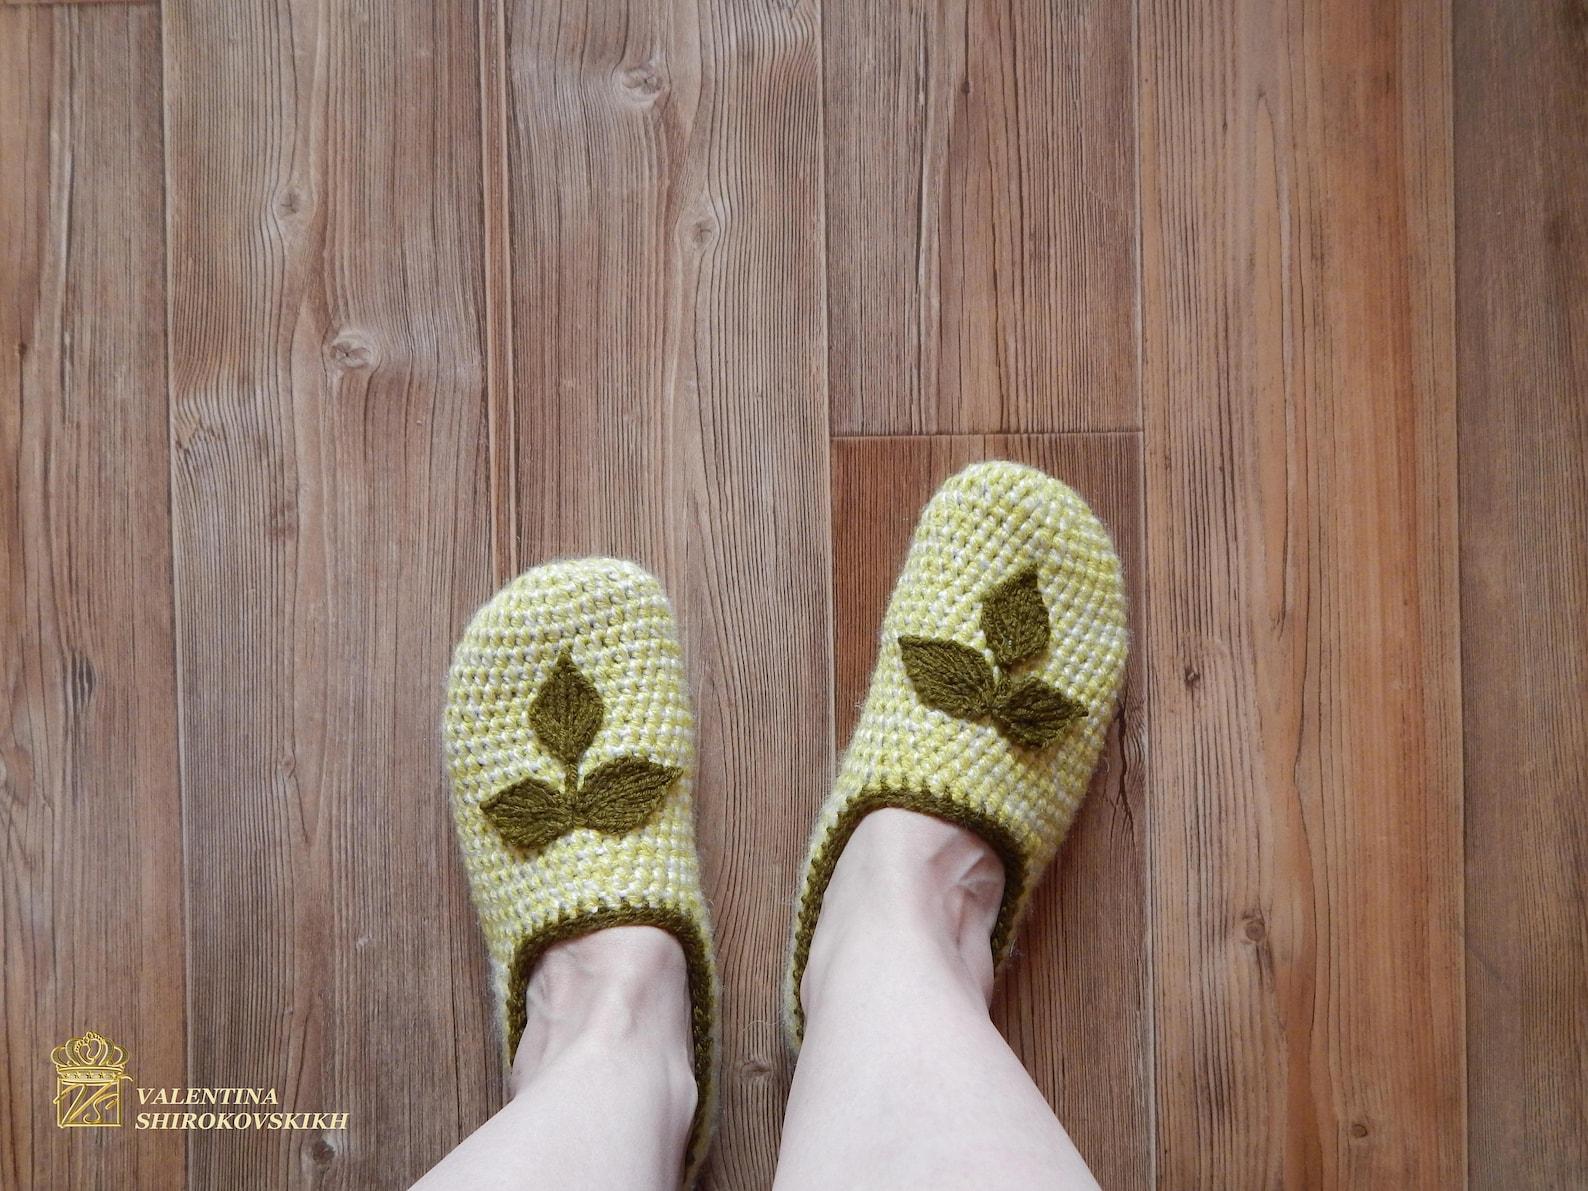 knitted female ballet shoes - knit slippers - crochet slippers for ladies - granny square - women's slippers - handmade hous